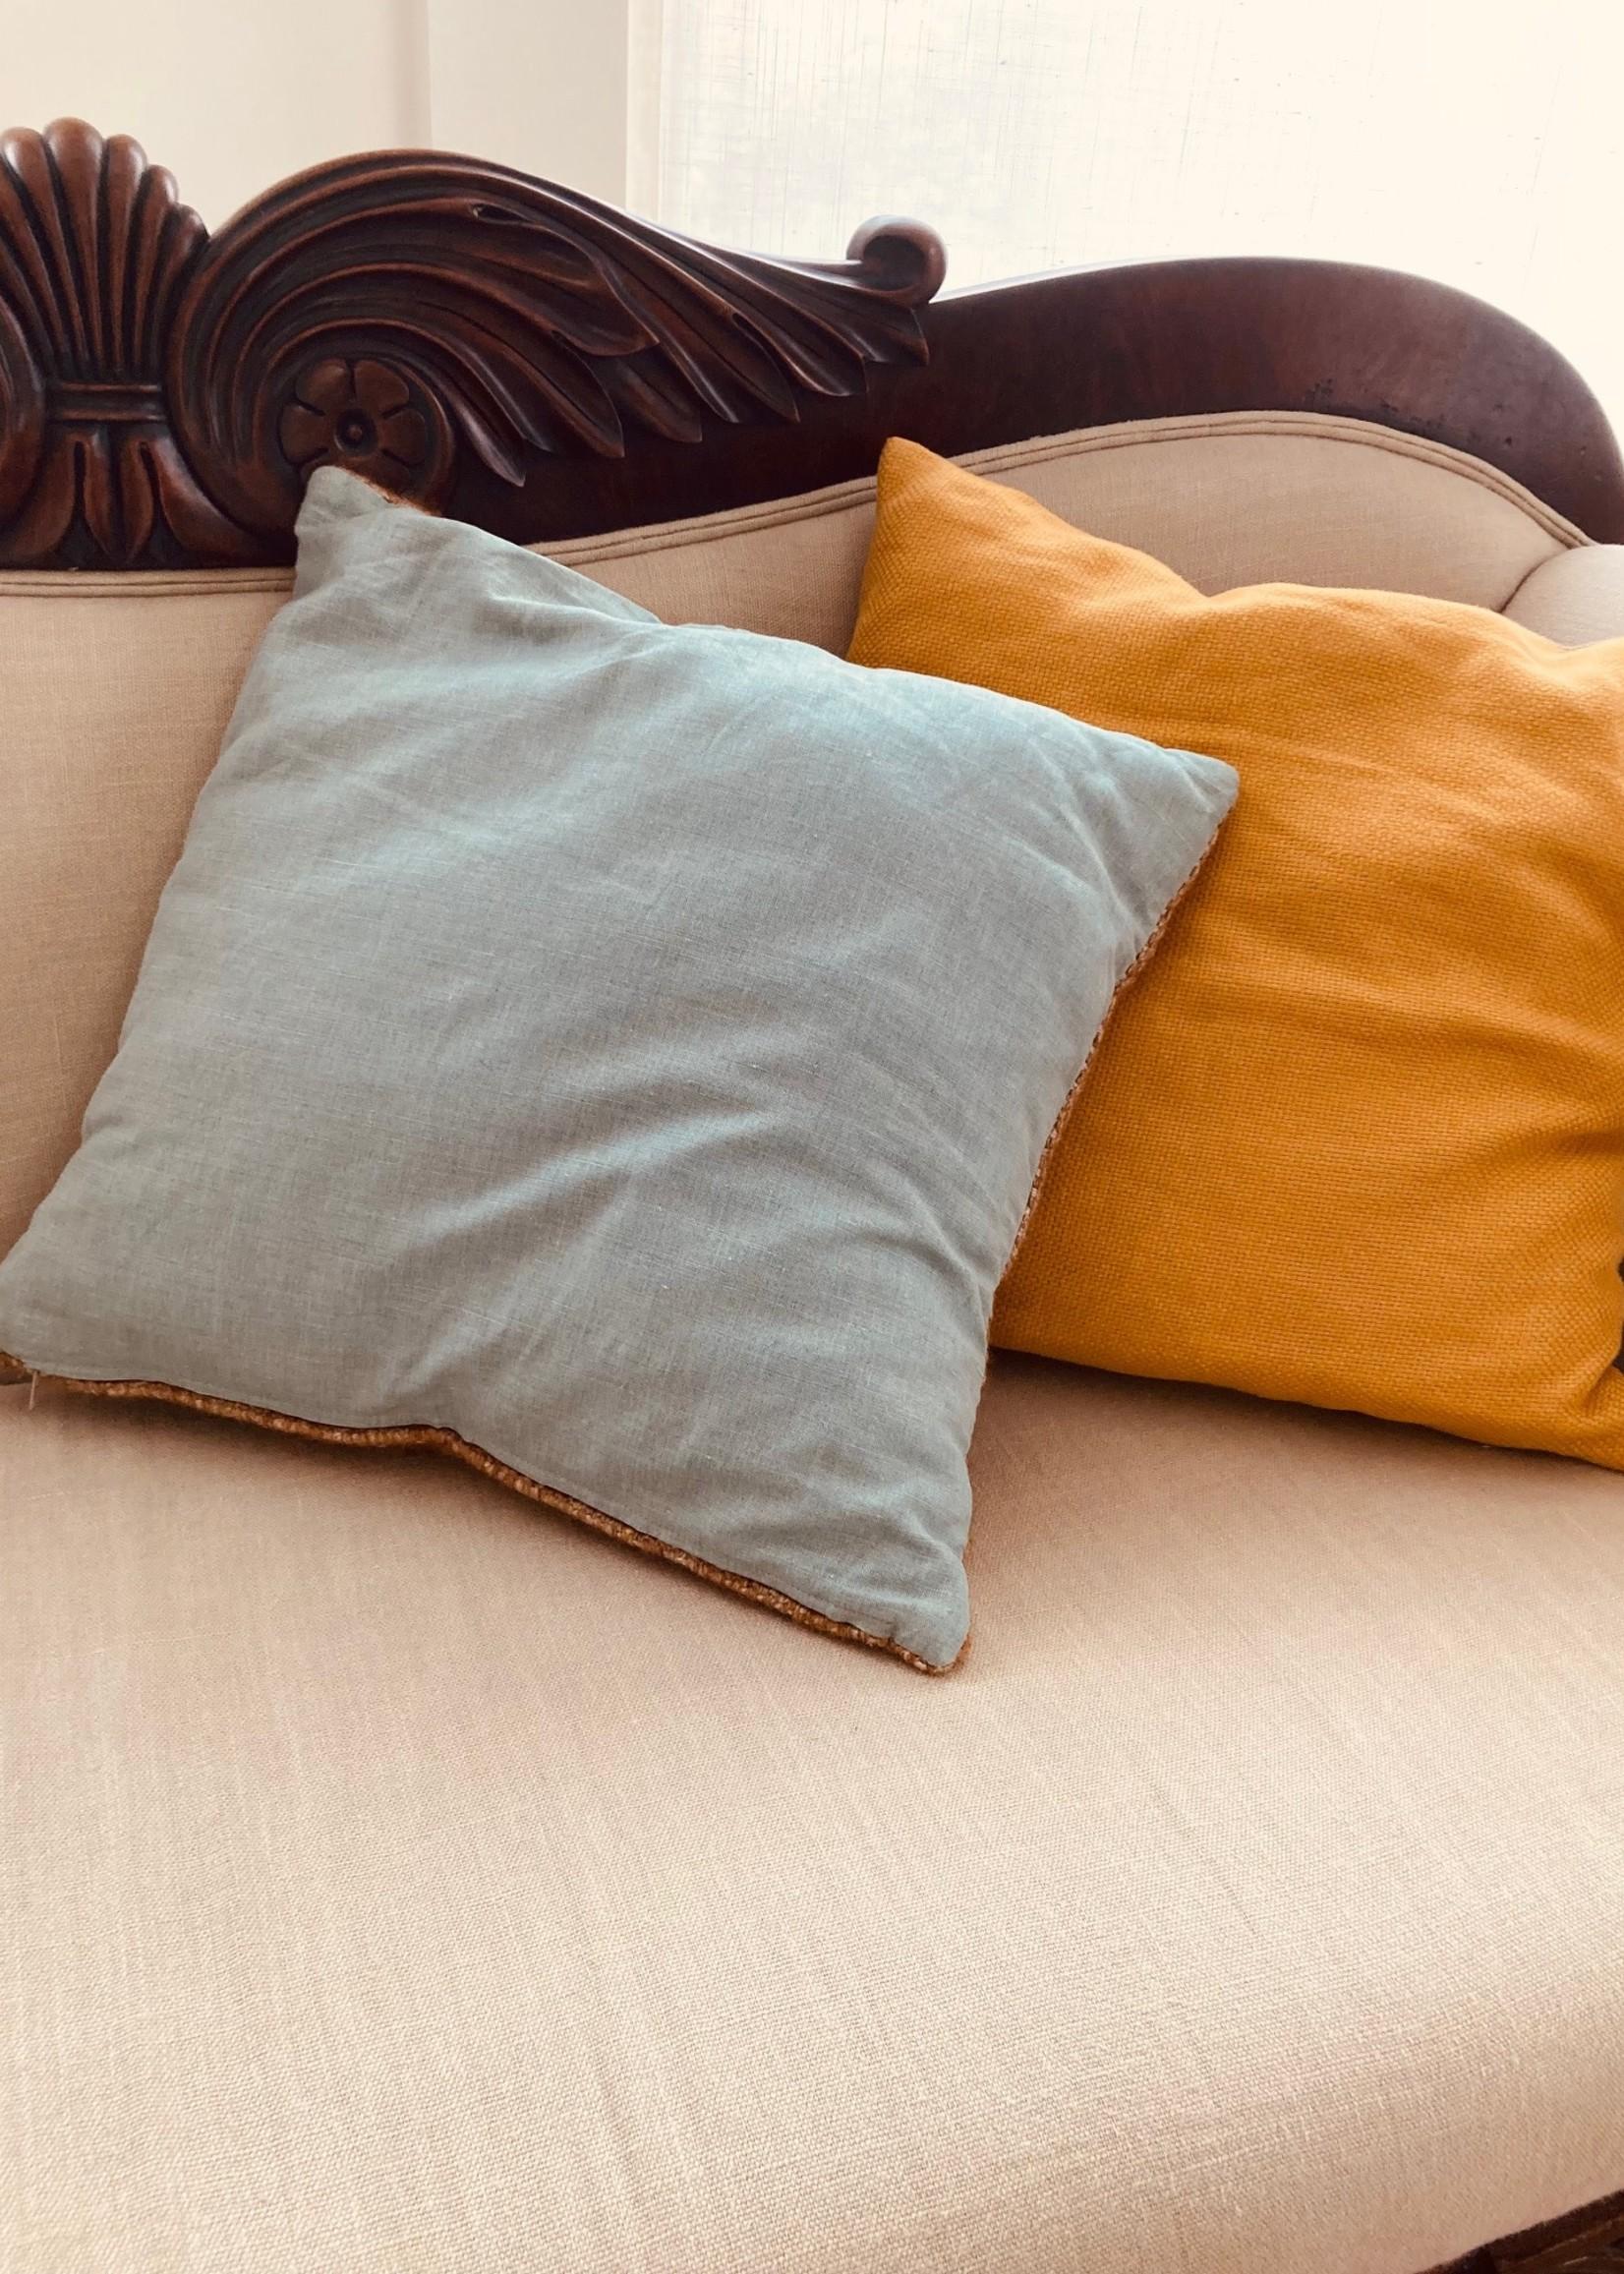 Linnen Cushionslope Custard yellow and brown